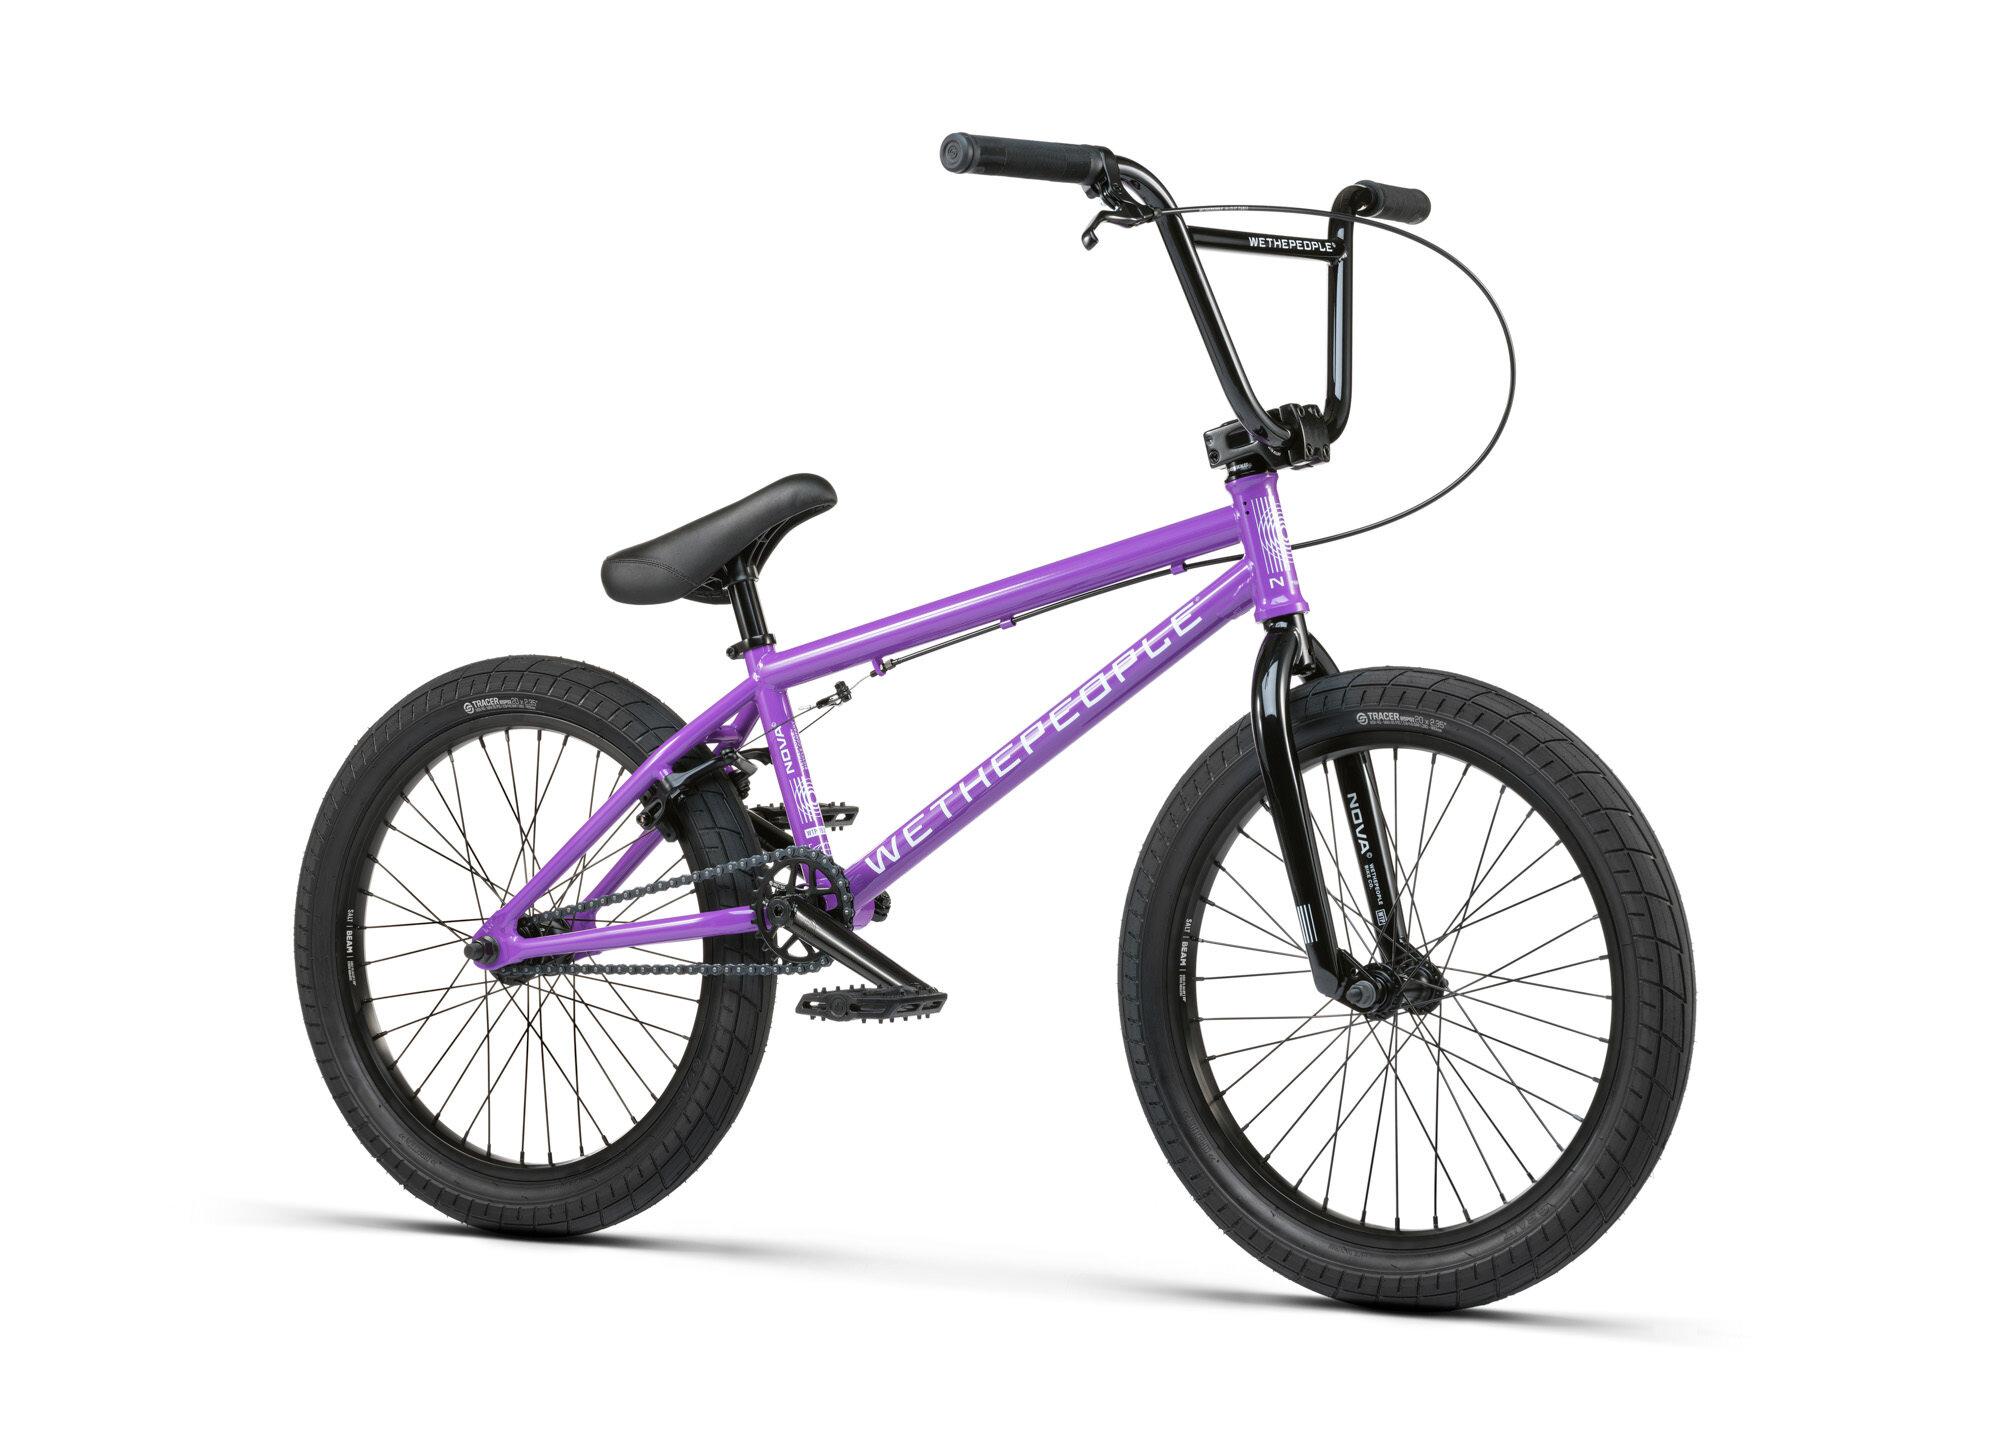 BMX WETHEPEOPLE NOVA 20 ULTRAVIOLET 2021